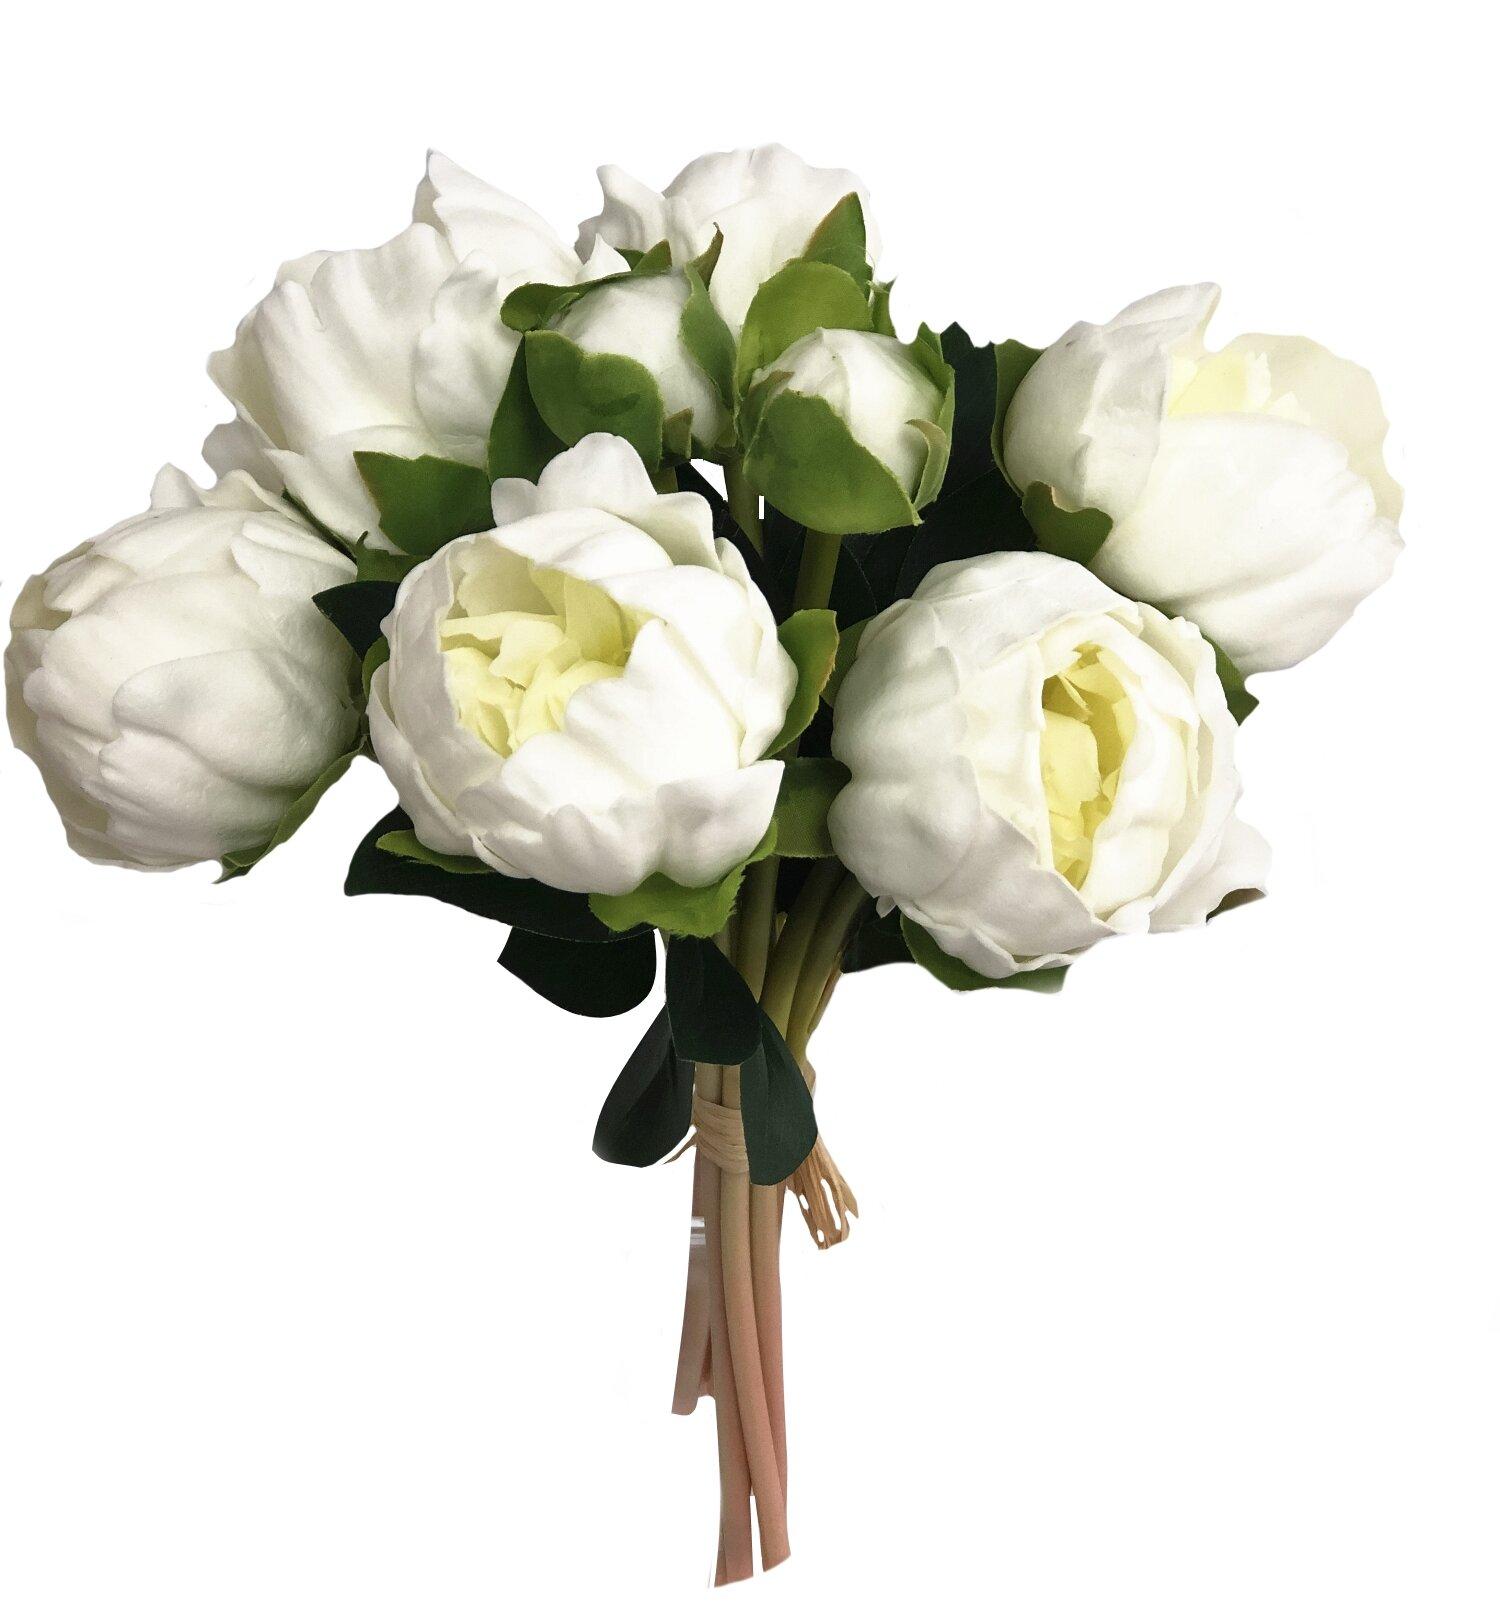 Blush Arrangements Faux Flowers You Ll Love In 2020 Wayfair